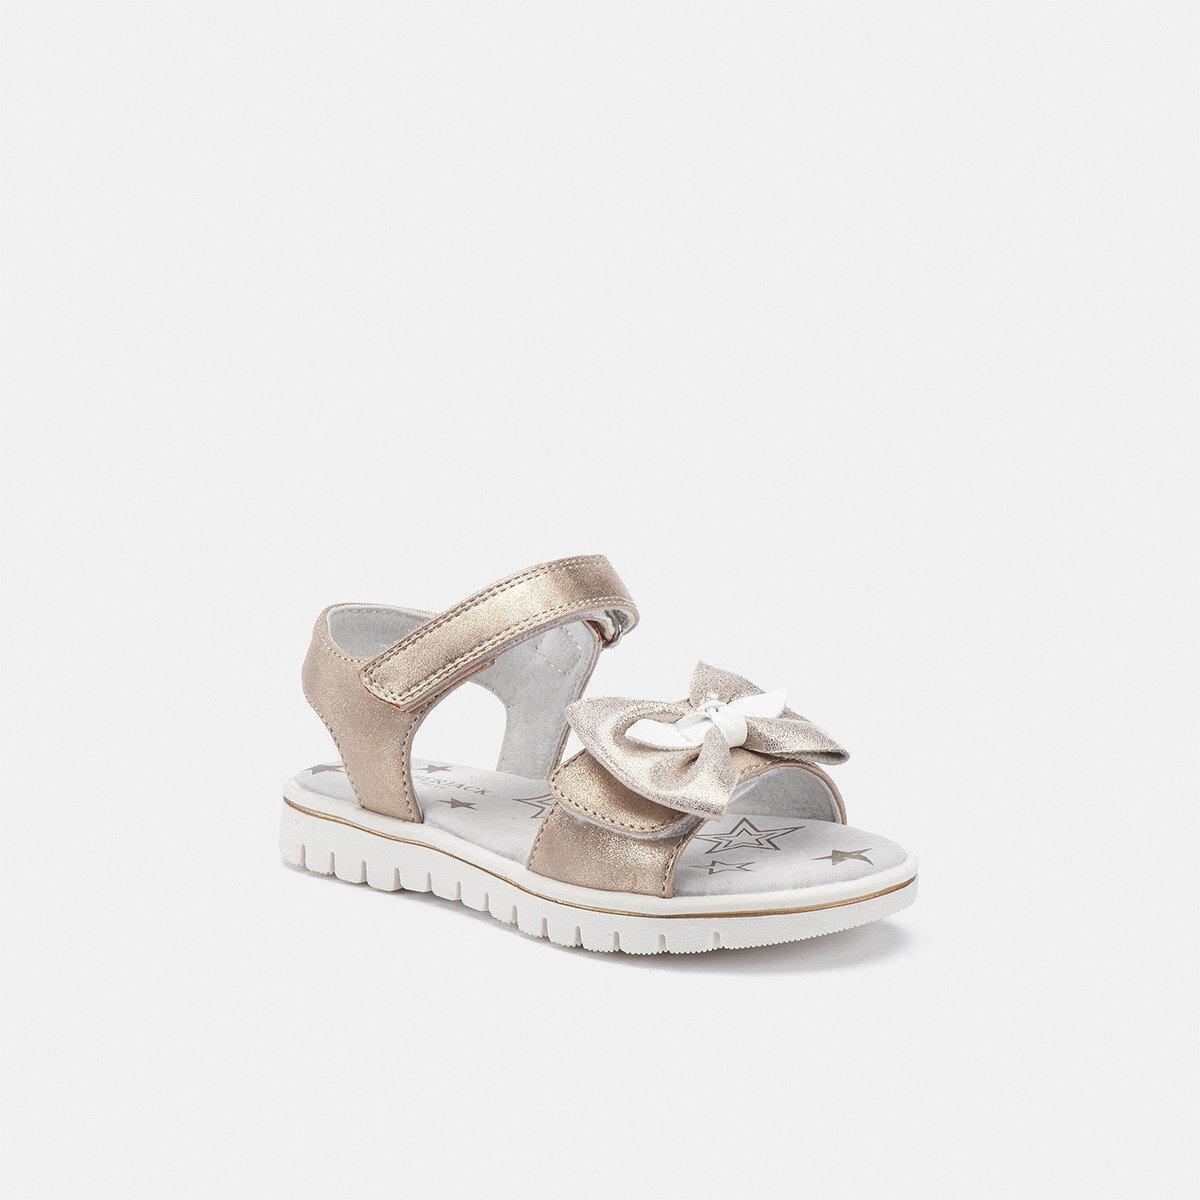 LARA GOLD Girl Sandals